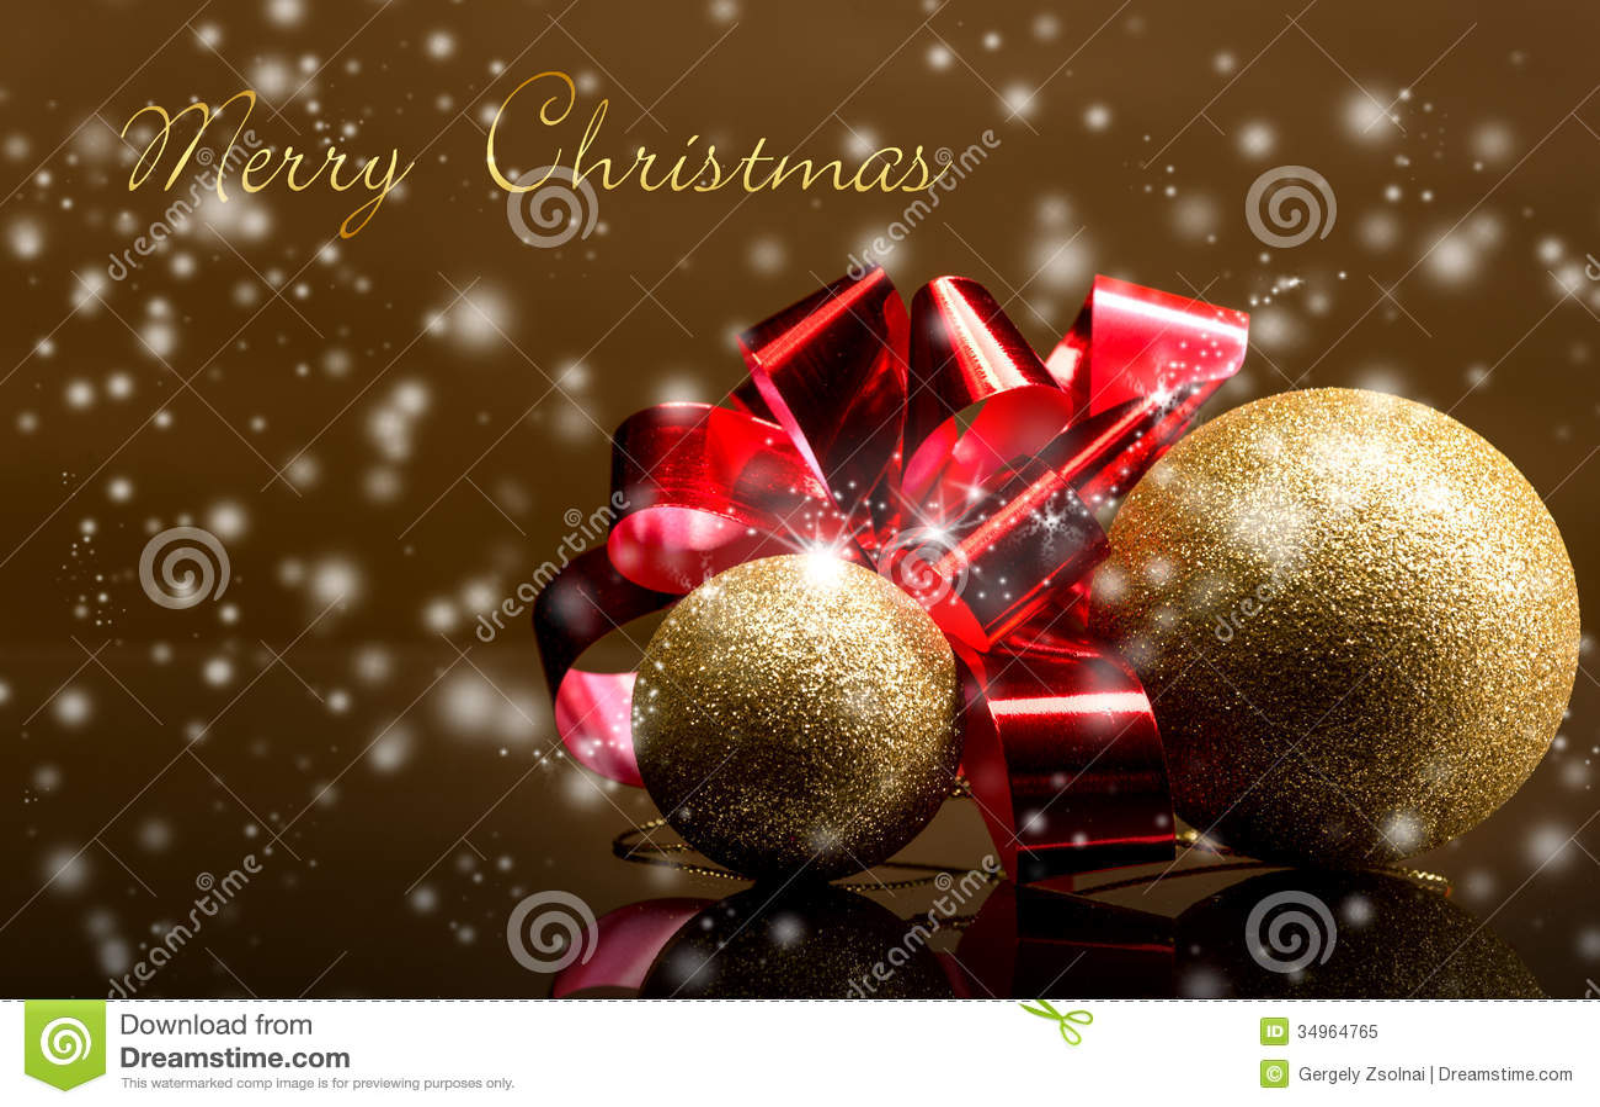 Merry christmas gift - 3 10